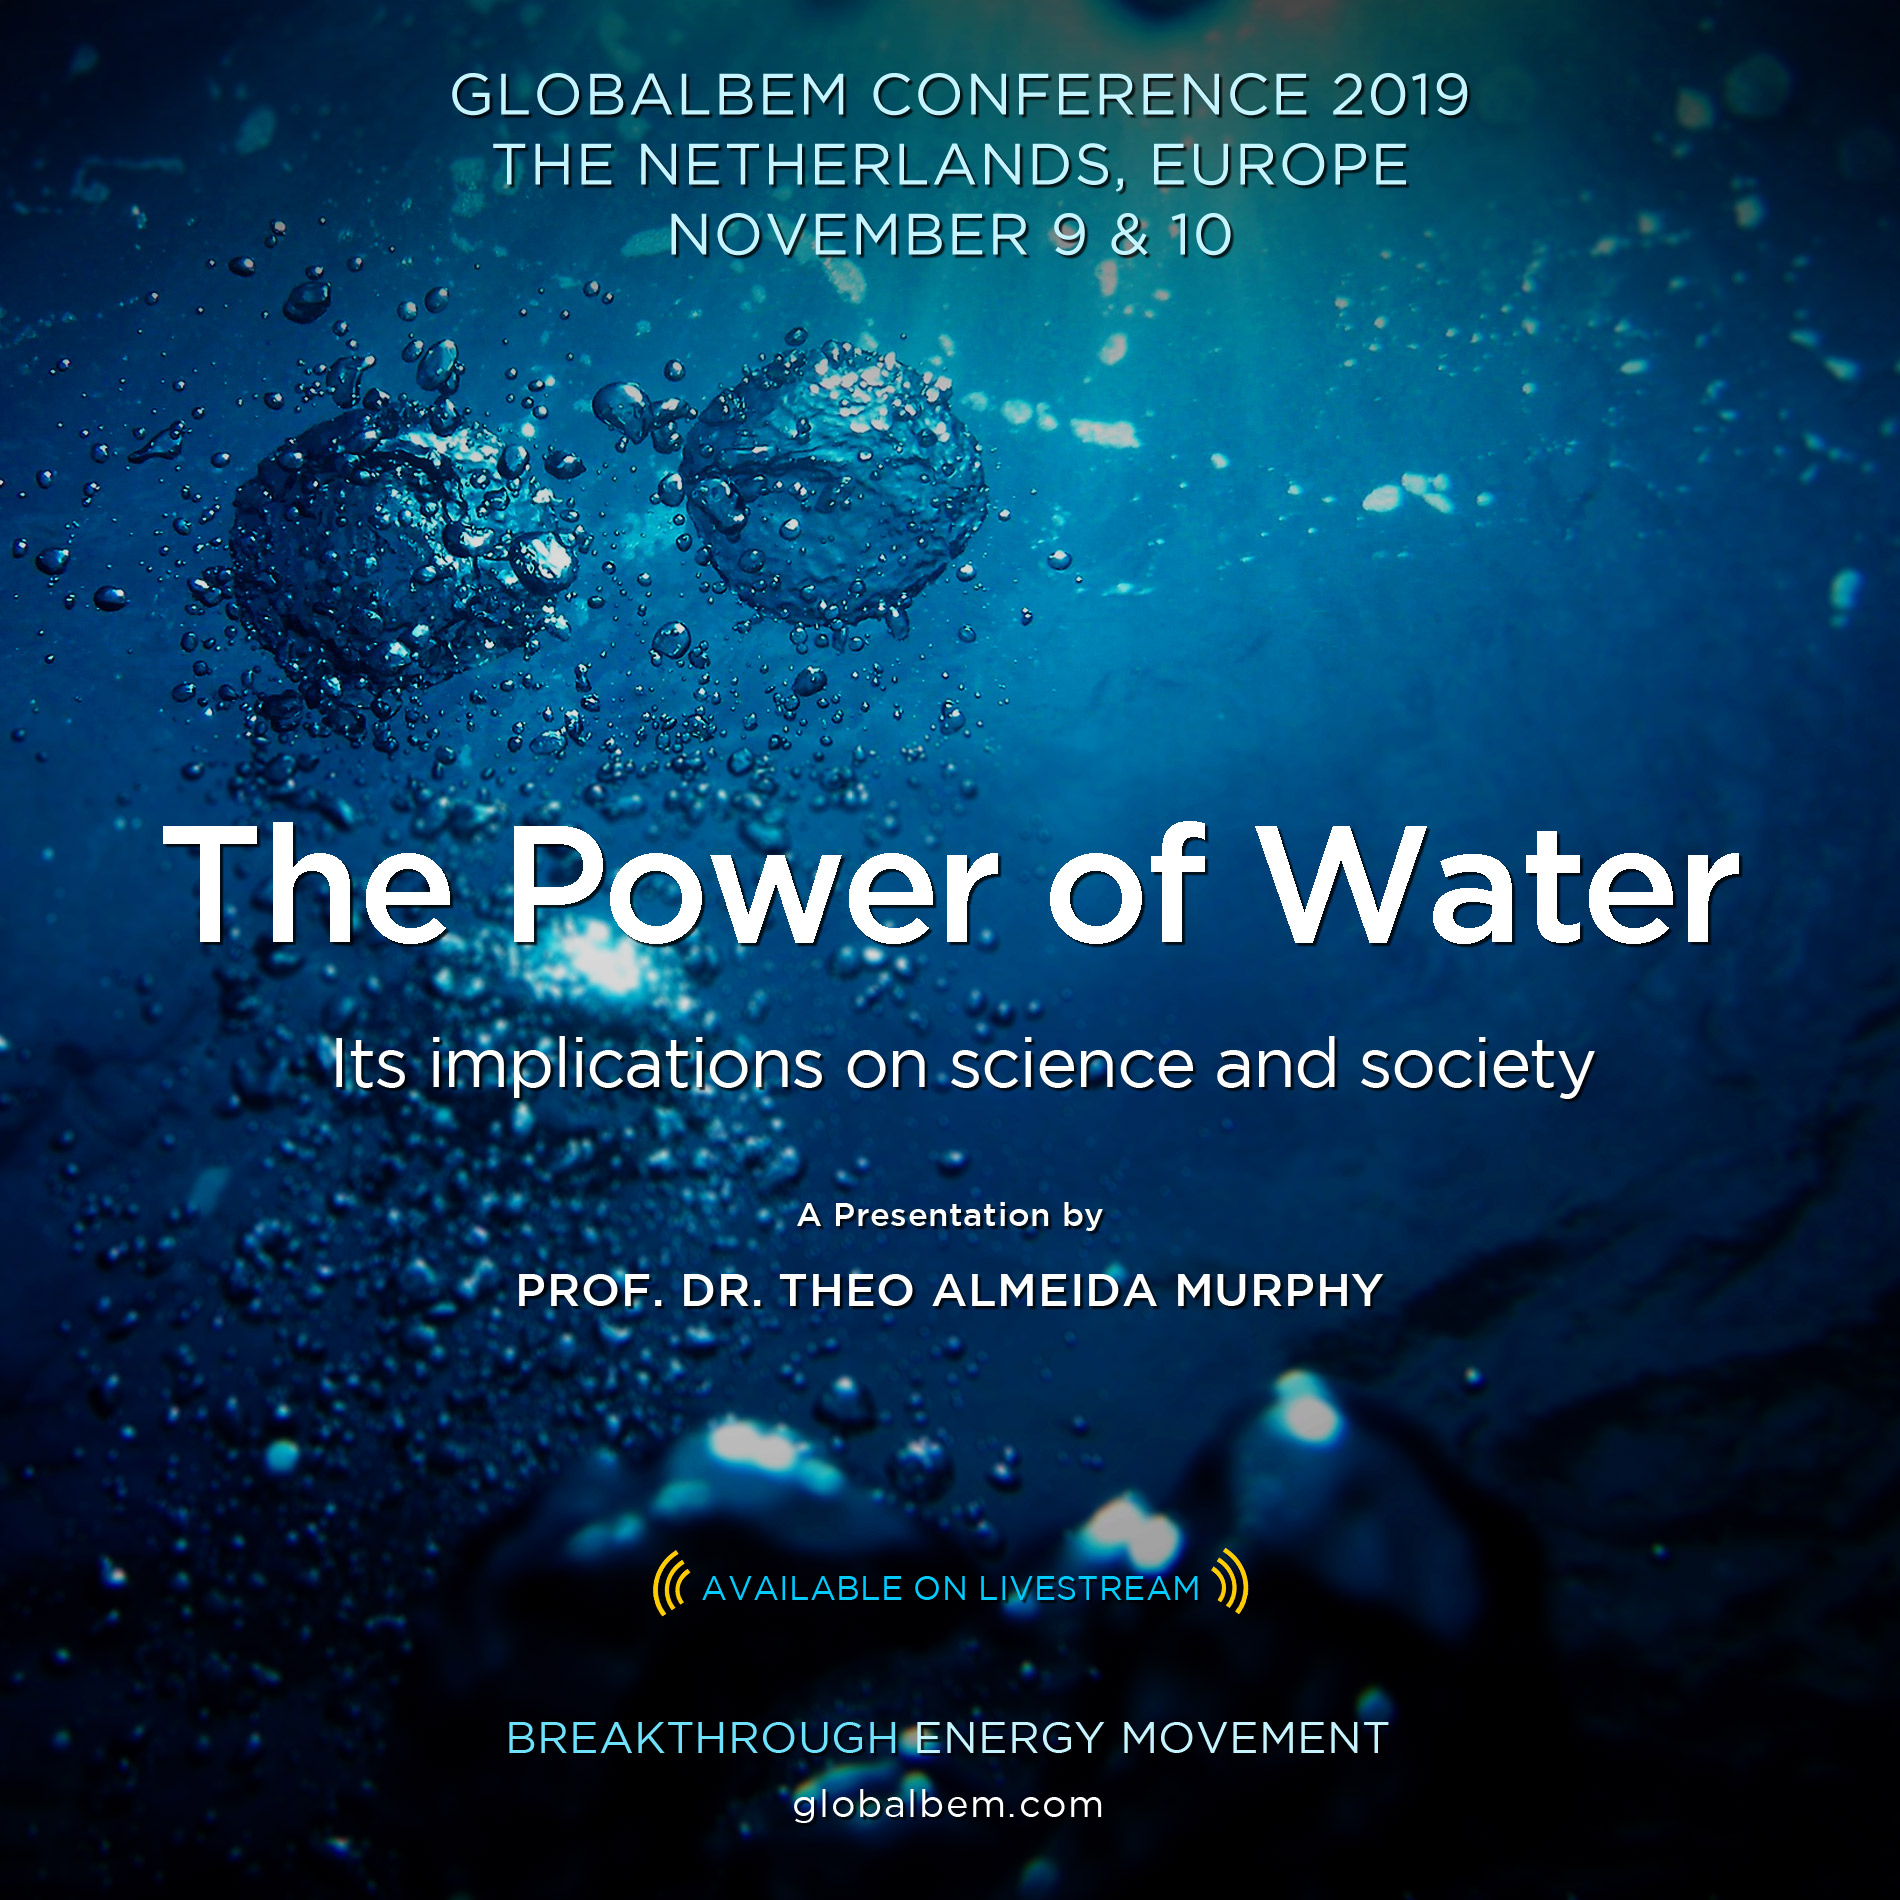 https://globalbem.com/wp-content/uploads/2019/10/144-Presentation-Promo-Theo-Almeida.jpg